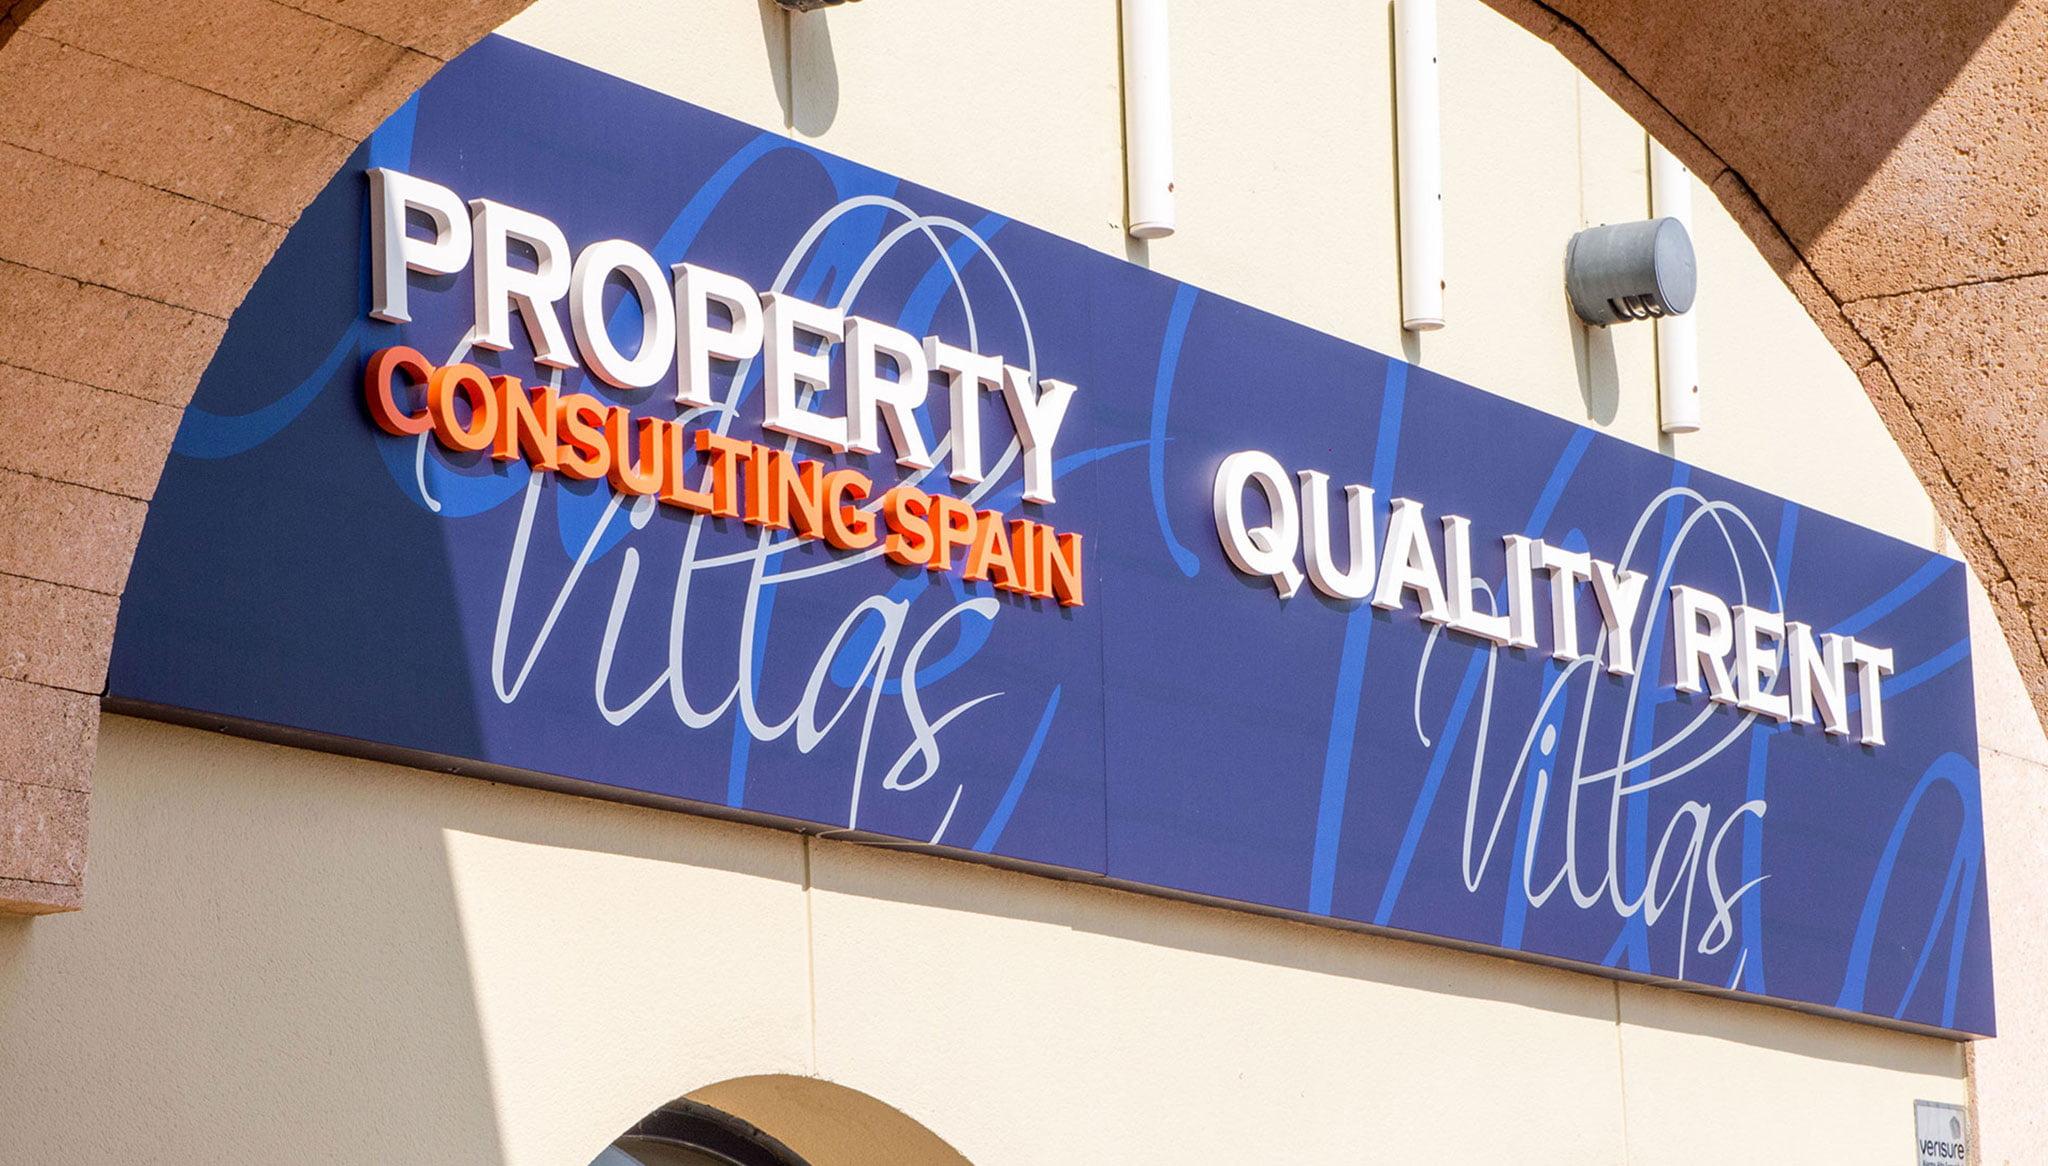 Poster met gevellogo - Kwaliteit Rent a Villa